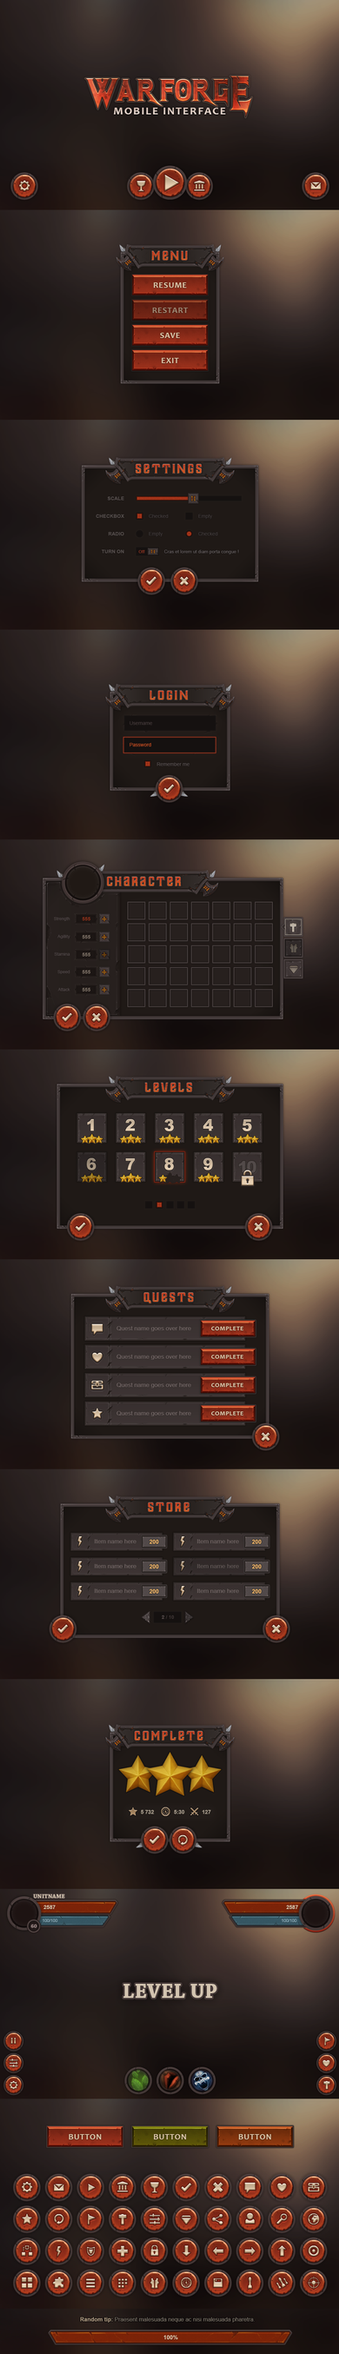 Warforge Mobile UI by Evil-S